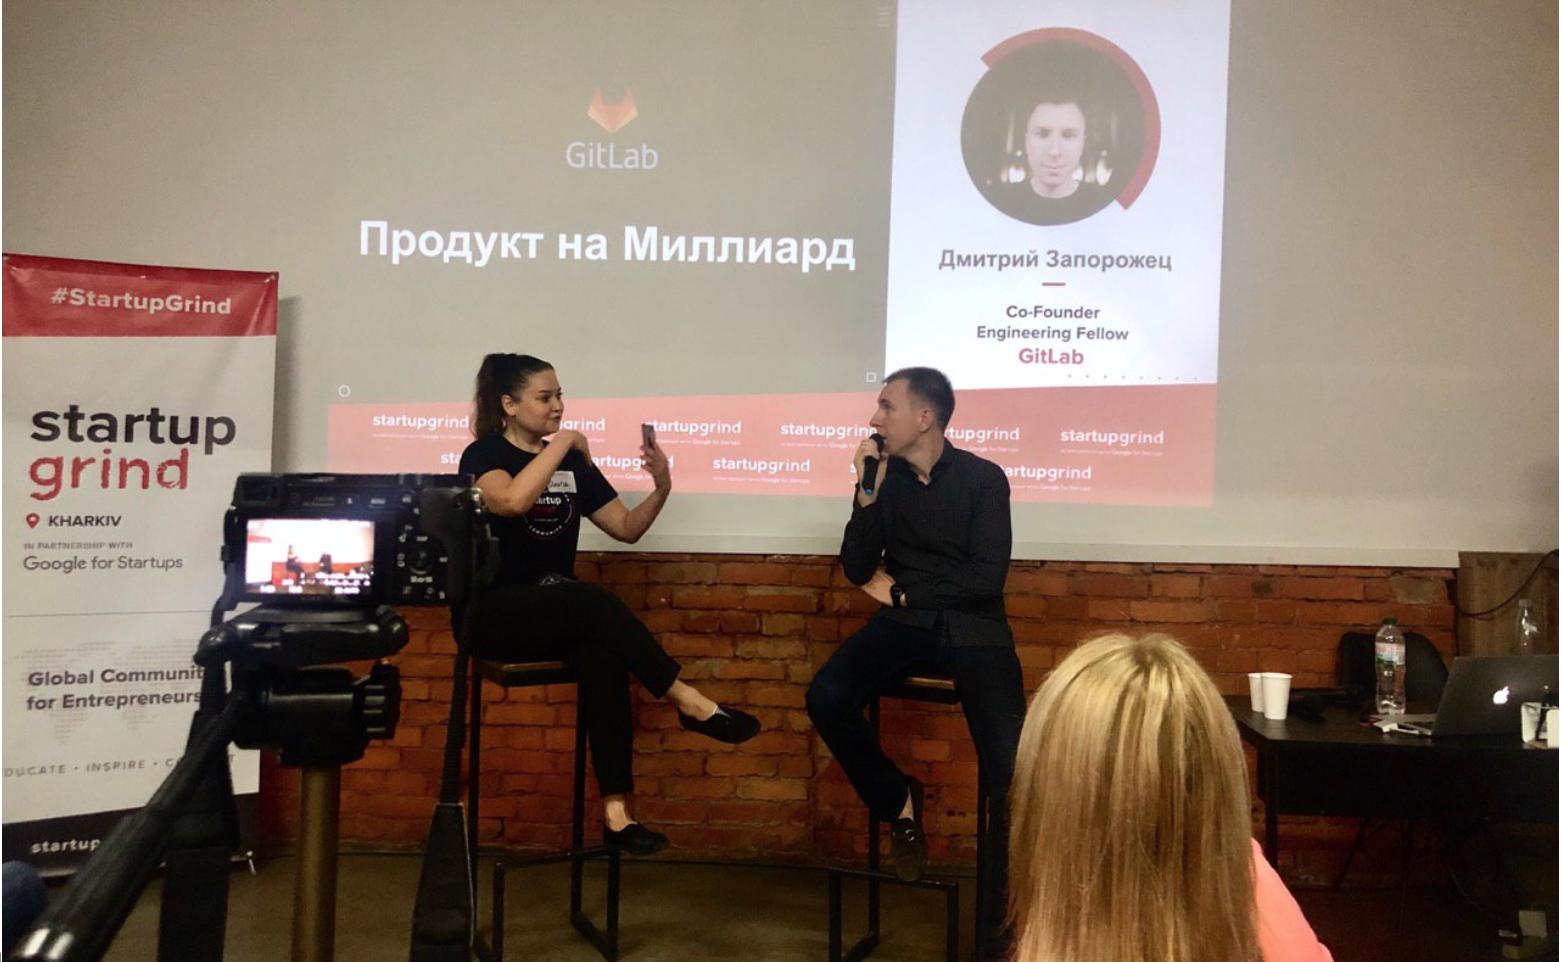 Snymok-ekrana-2019-09-26-v-09.08.39 Kharkiv IT Cluster поддерживает стартап движение Украины!